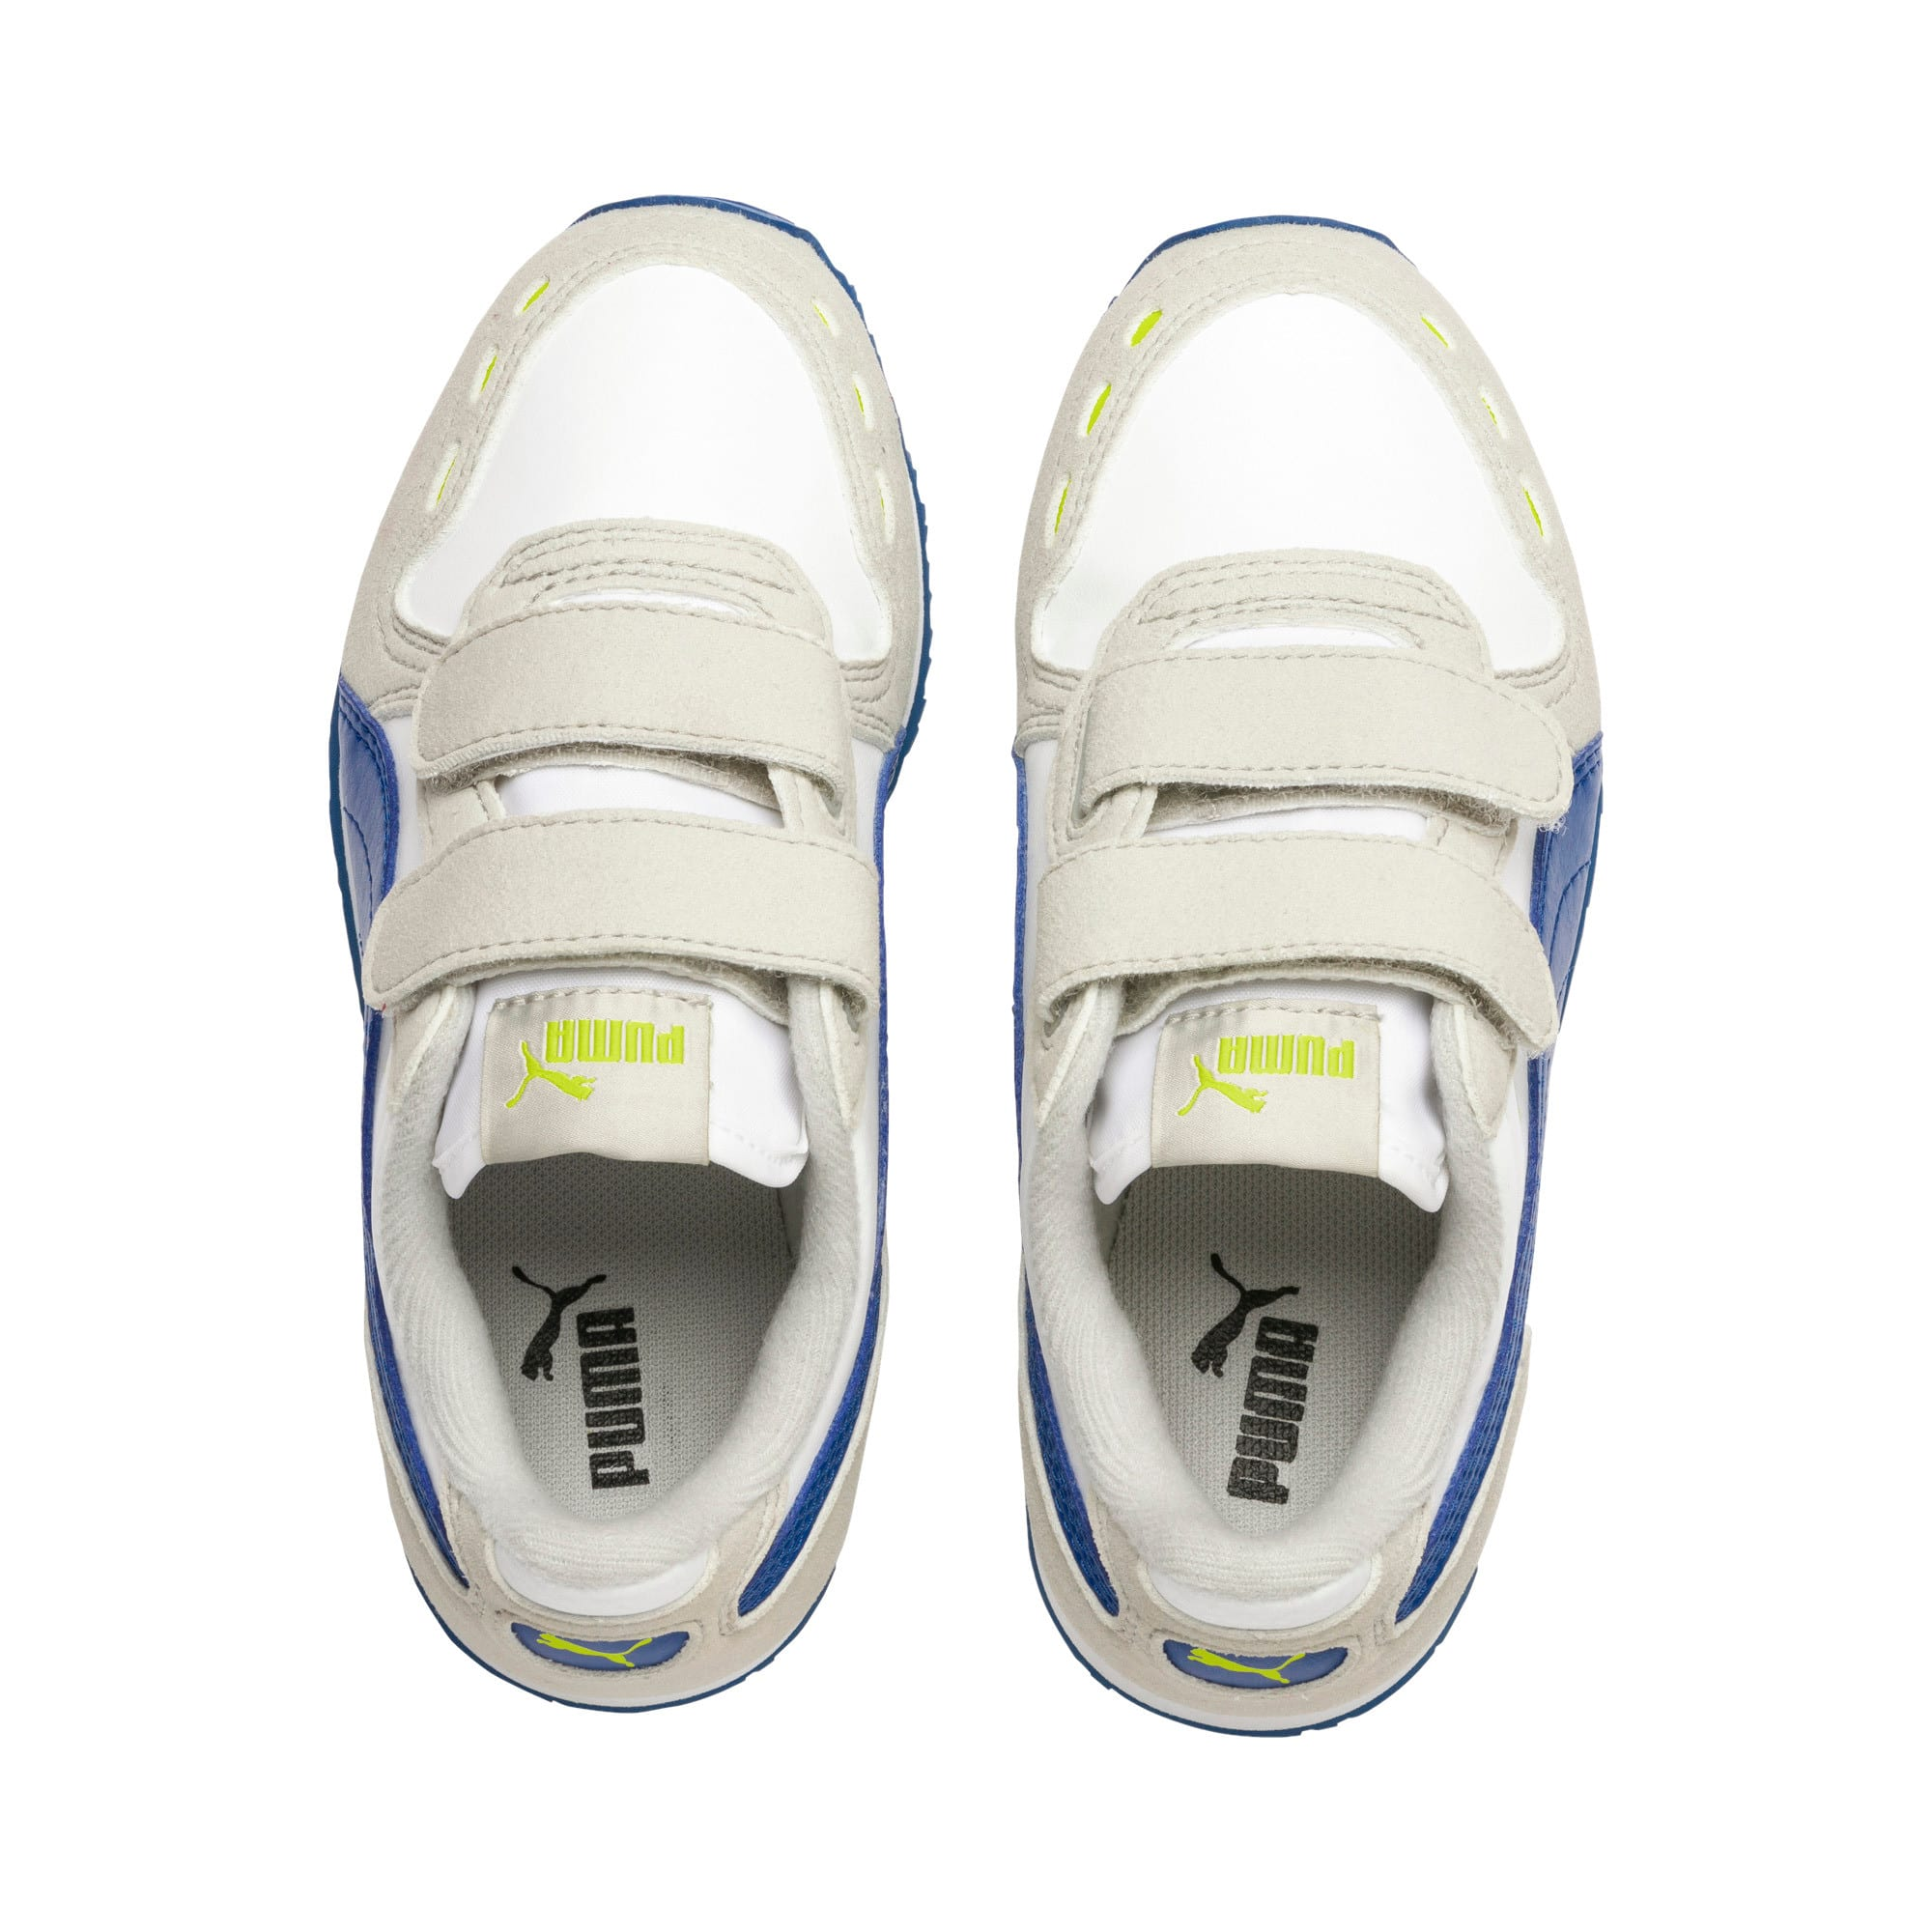 Thumbnail 6 of Cabana Racer SL V PS Baby Sneaker, Puma White-Galaxy Blue, medium